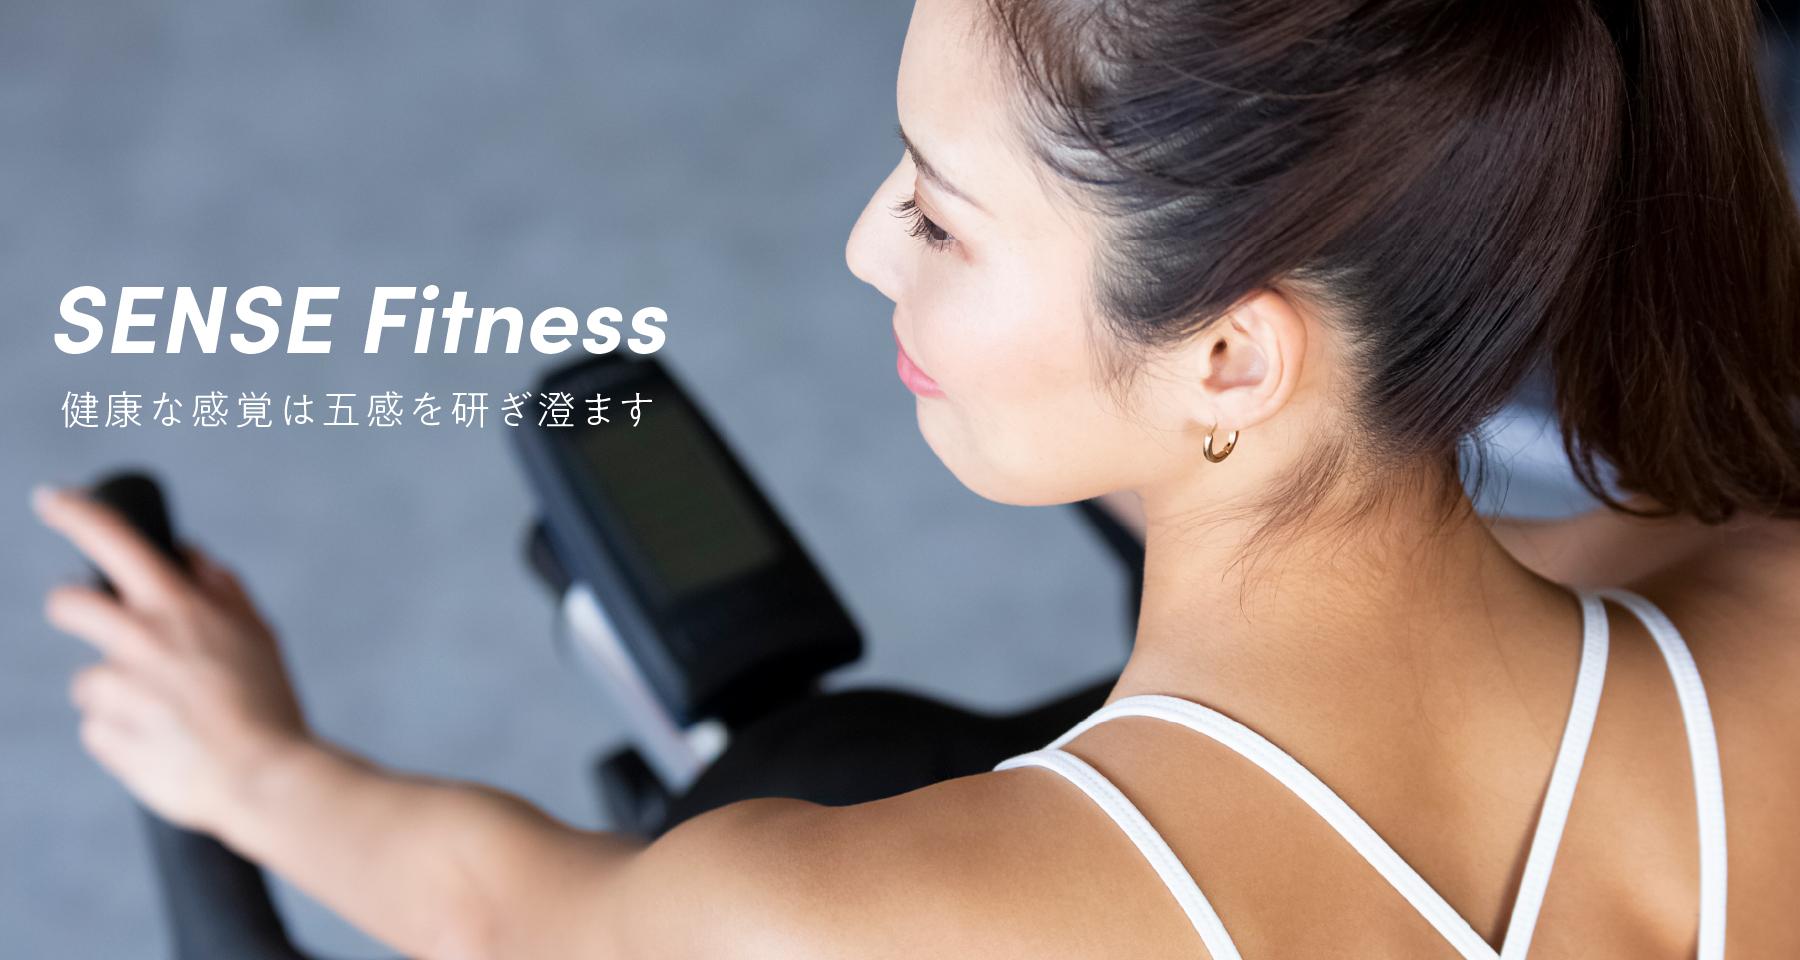 SENSEfitness健康な感覚は五感を研ぎ澄ます